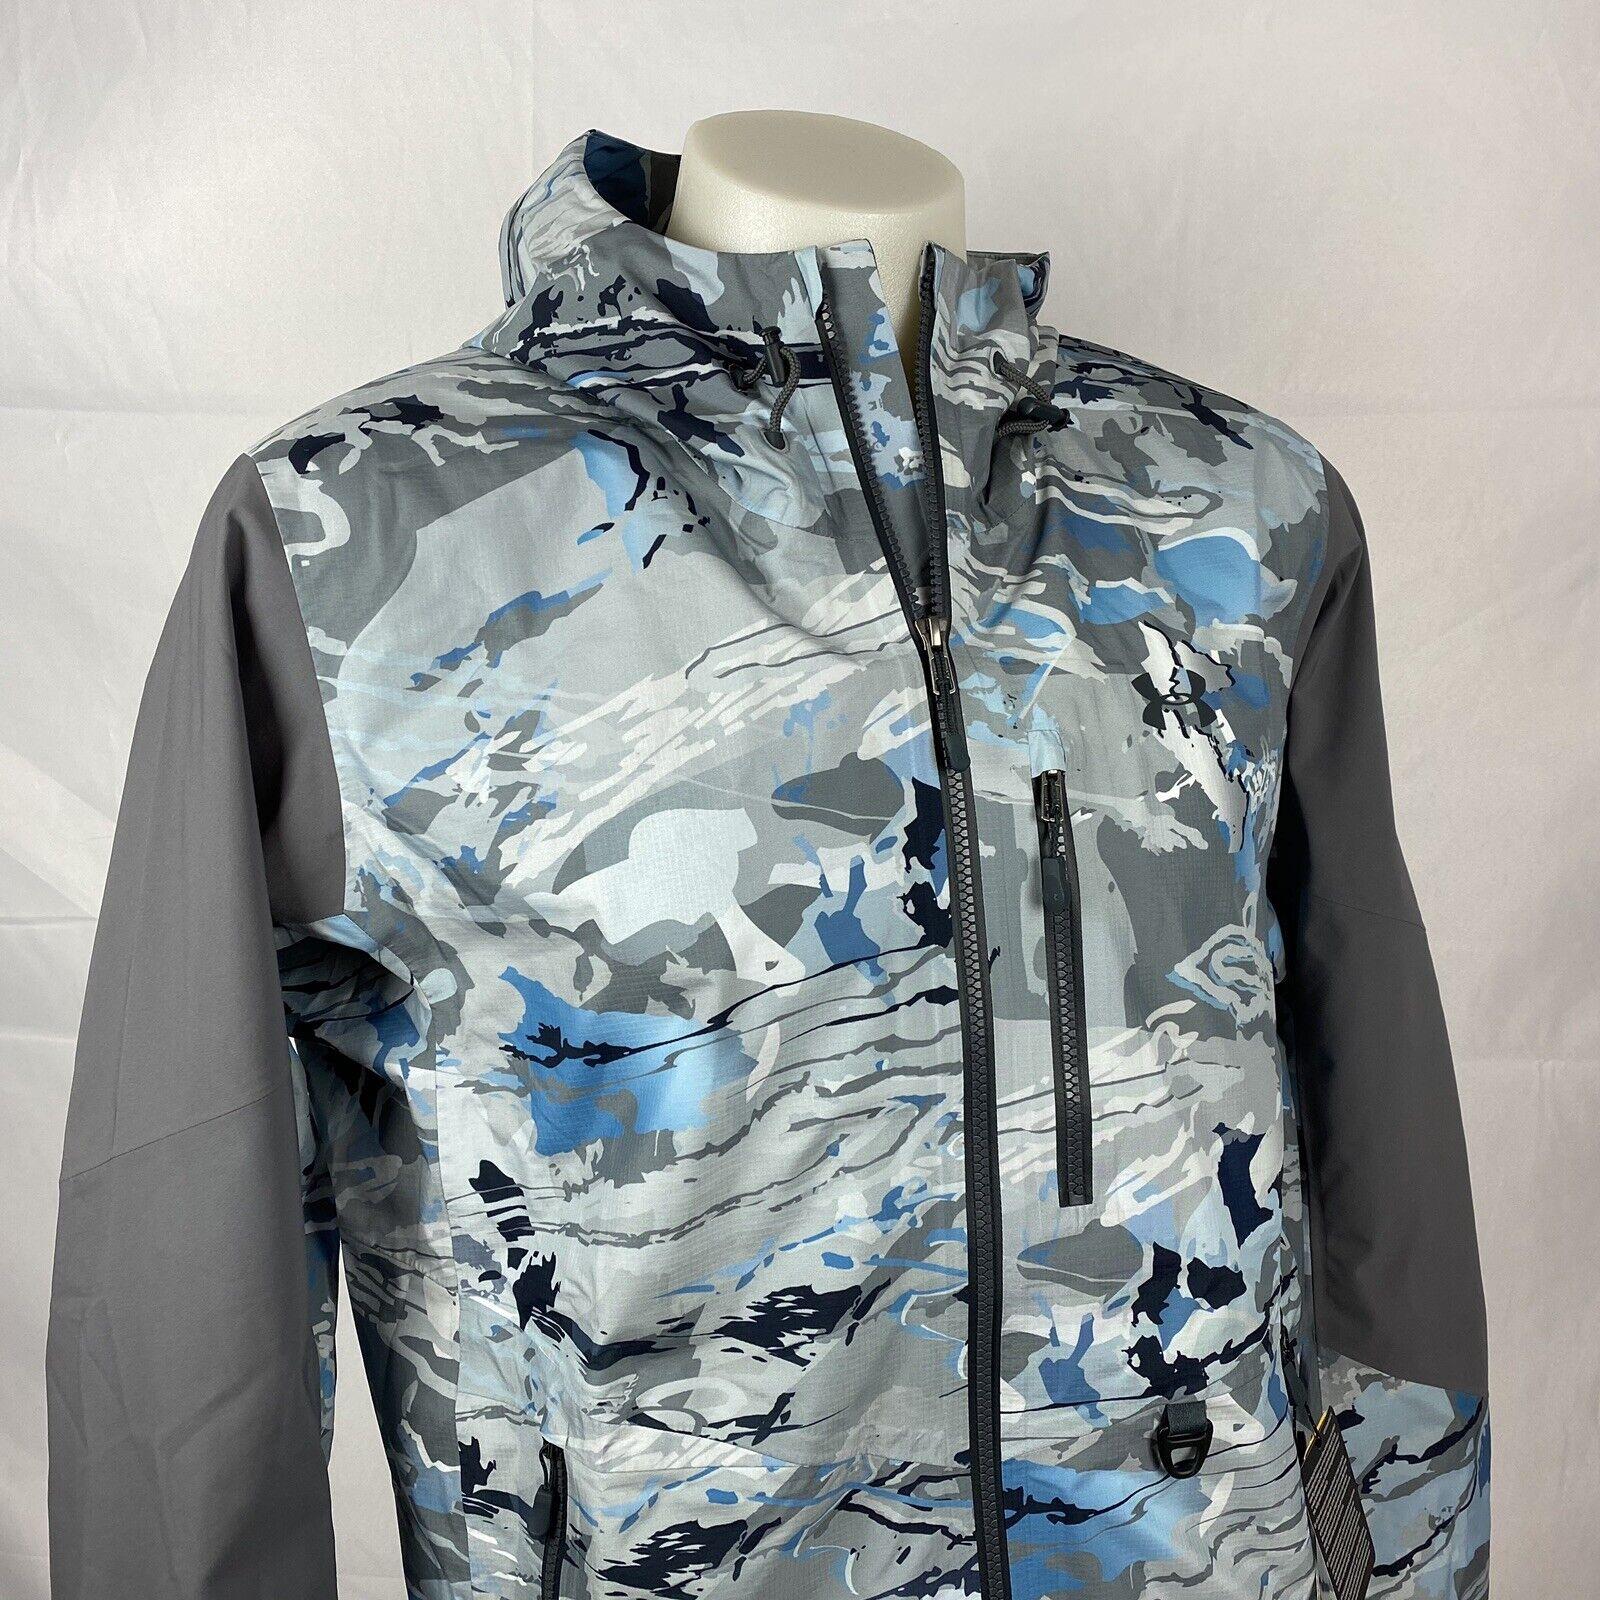 Under Armour Mens Gore-Tex Shoreman Jacket Weatherproof Brea